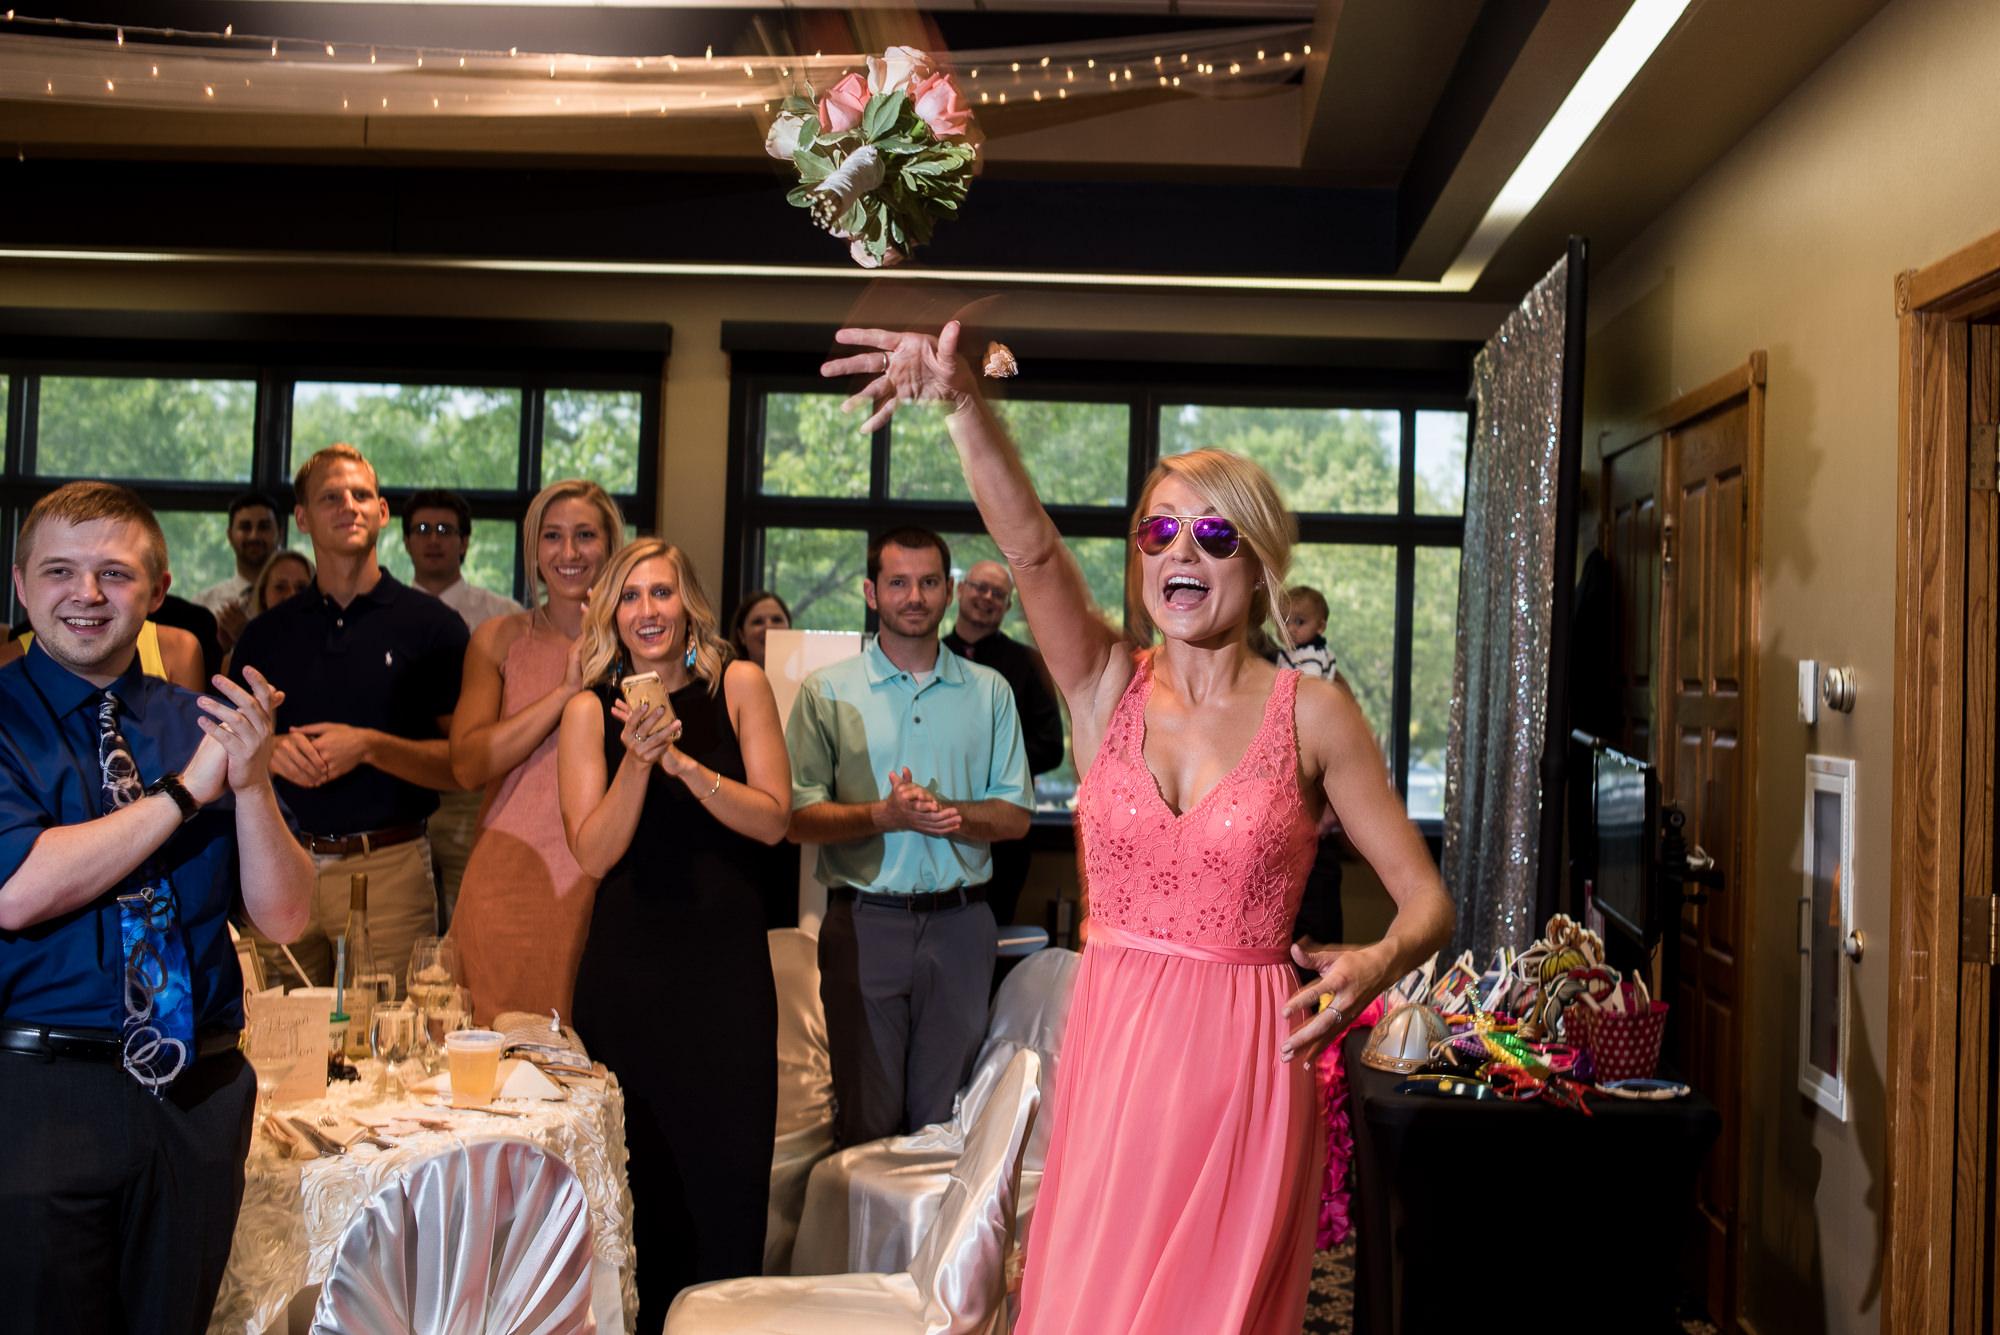 DAKOTA-DUNES-WEDDING-SOUTH-DAKOTA-WEDDING-PHOTOGRAPHER-0021.jpg